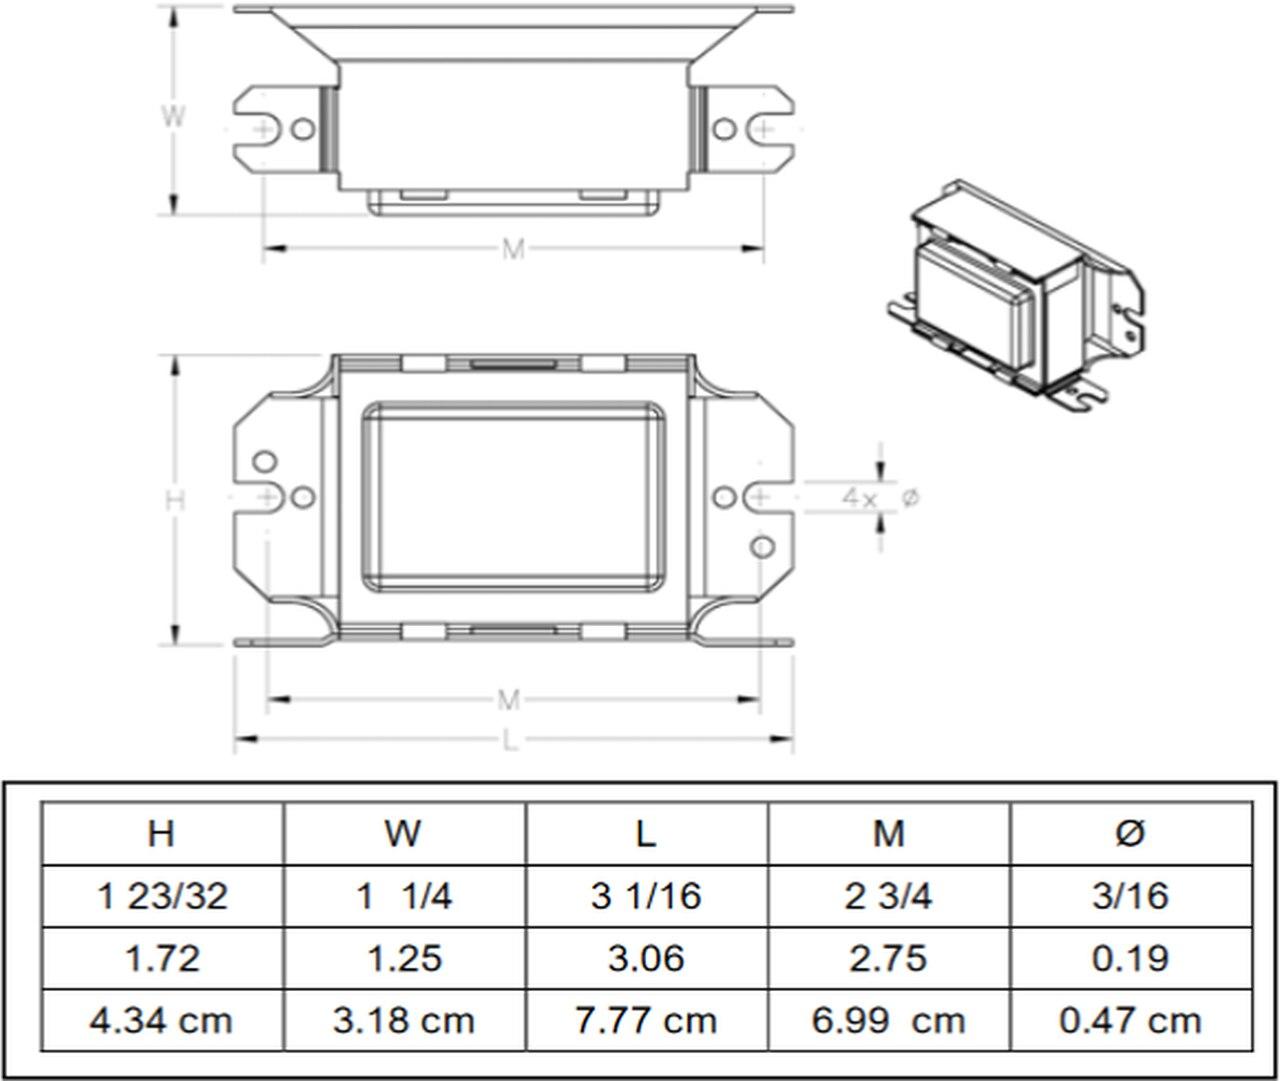 [DIAGRAM_3ER]  FR_4892] Wiring Diagram Also 2 L Ballast Wiring Diagram In Addition  Fluorescent | T8 Ballast Wiring Diagram Robertson |  | Istic Tacle Sple Shopa Gray Semec Mohammedshrine Librar Wiring 101